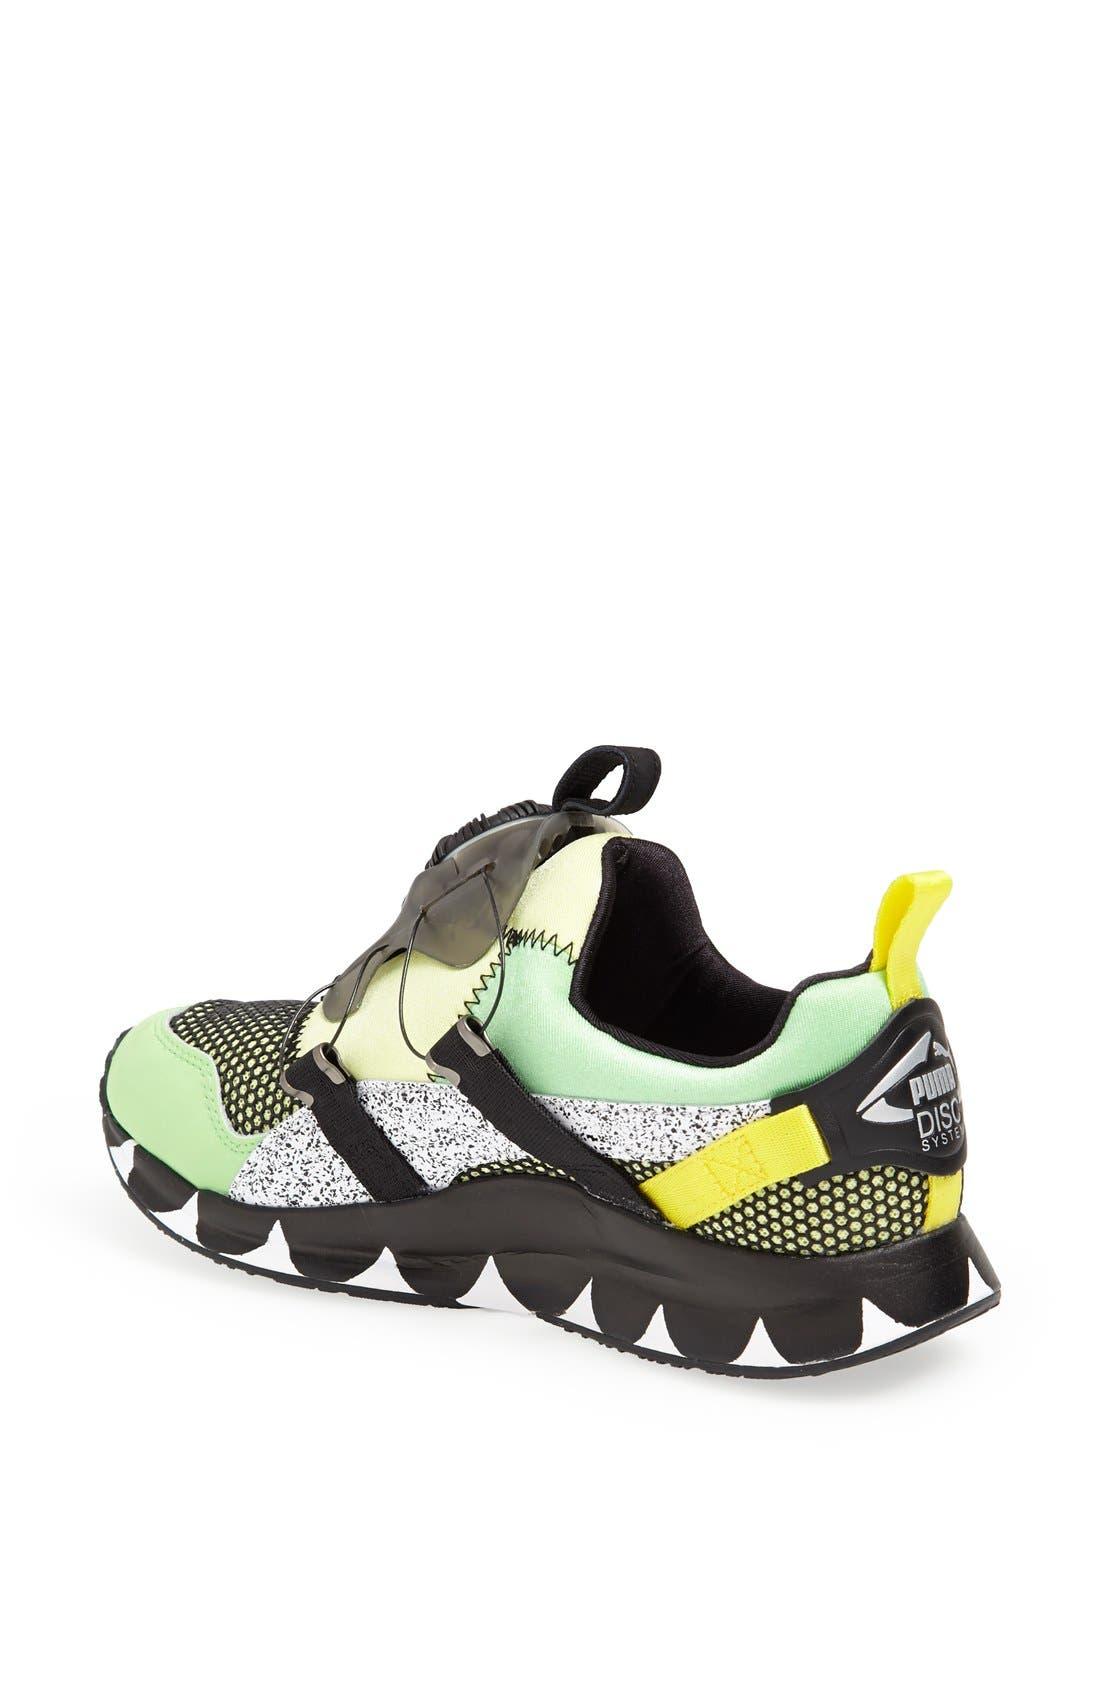 PUMA, 'Disc - Solange' Sneaker, Alternate thumbnail 4, color, 020